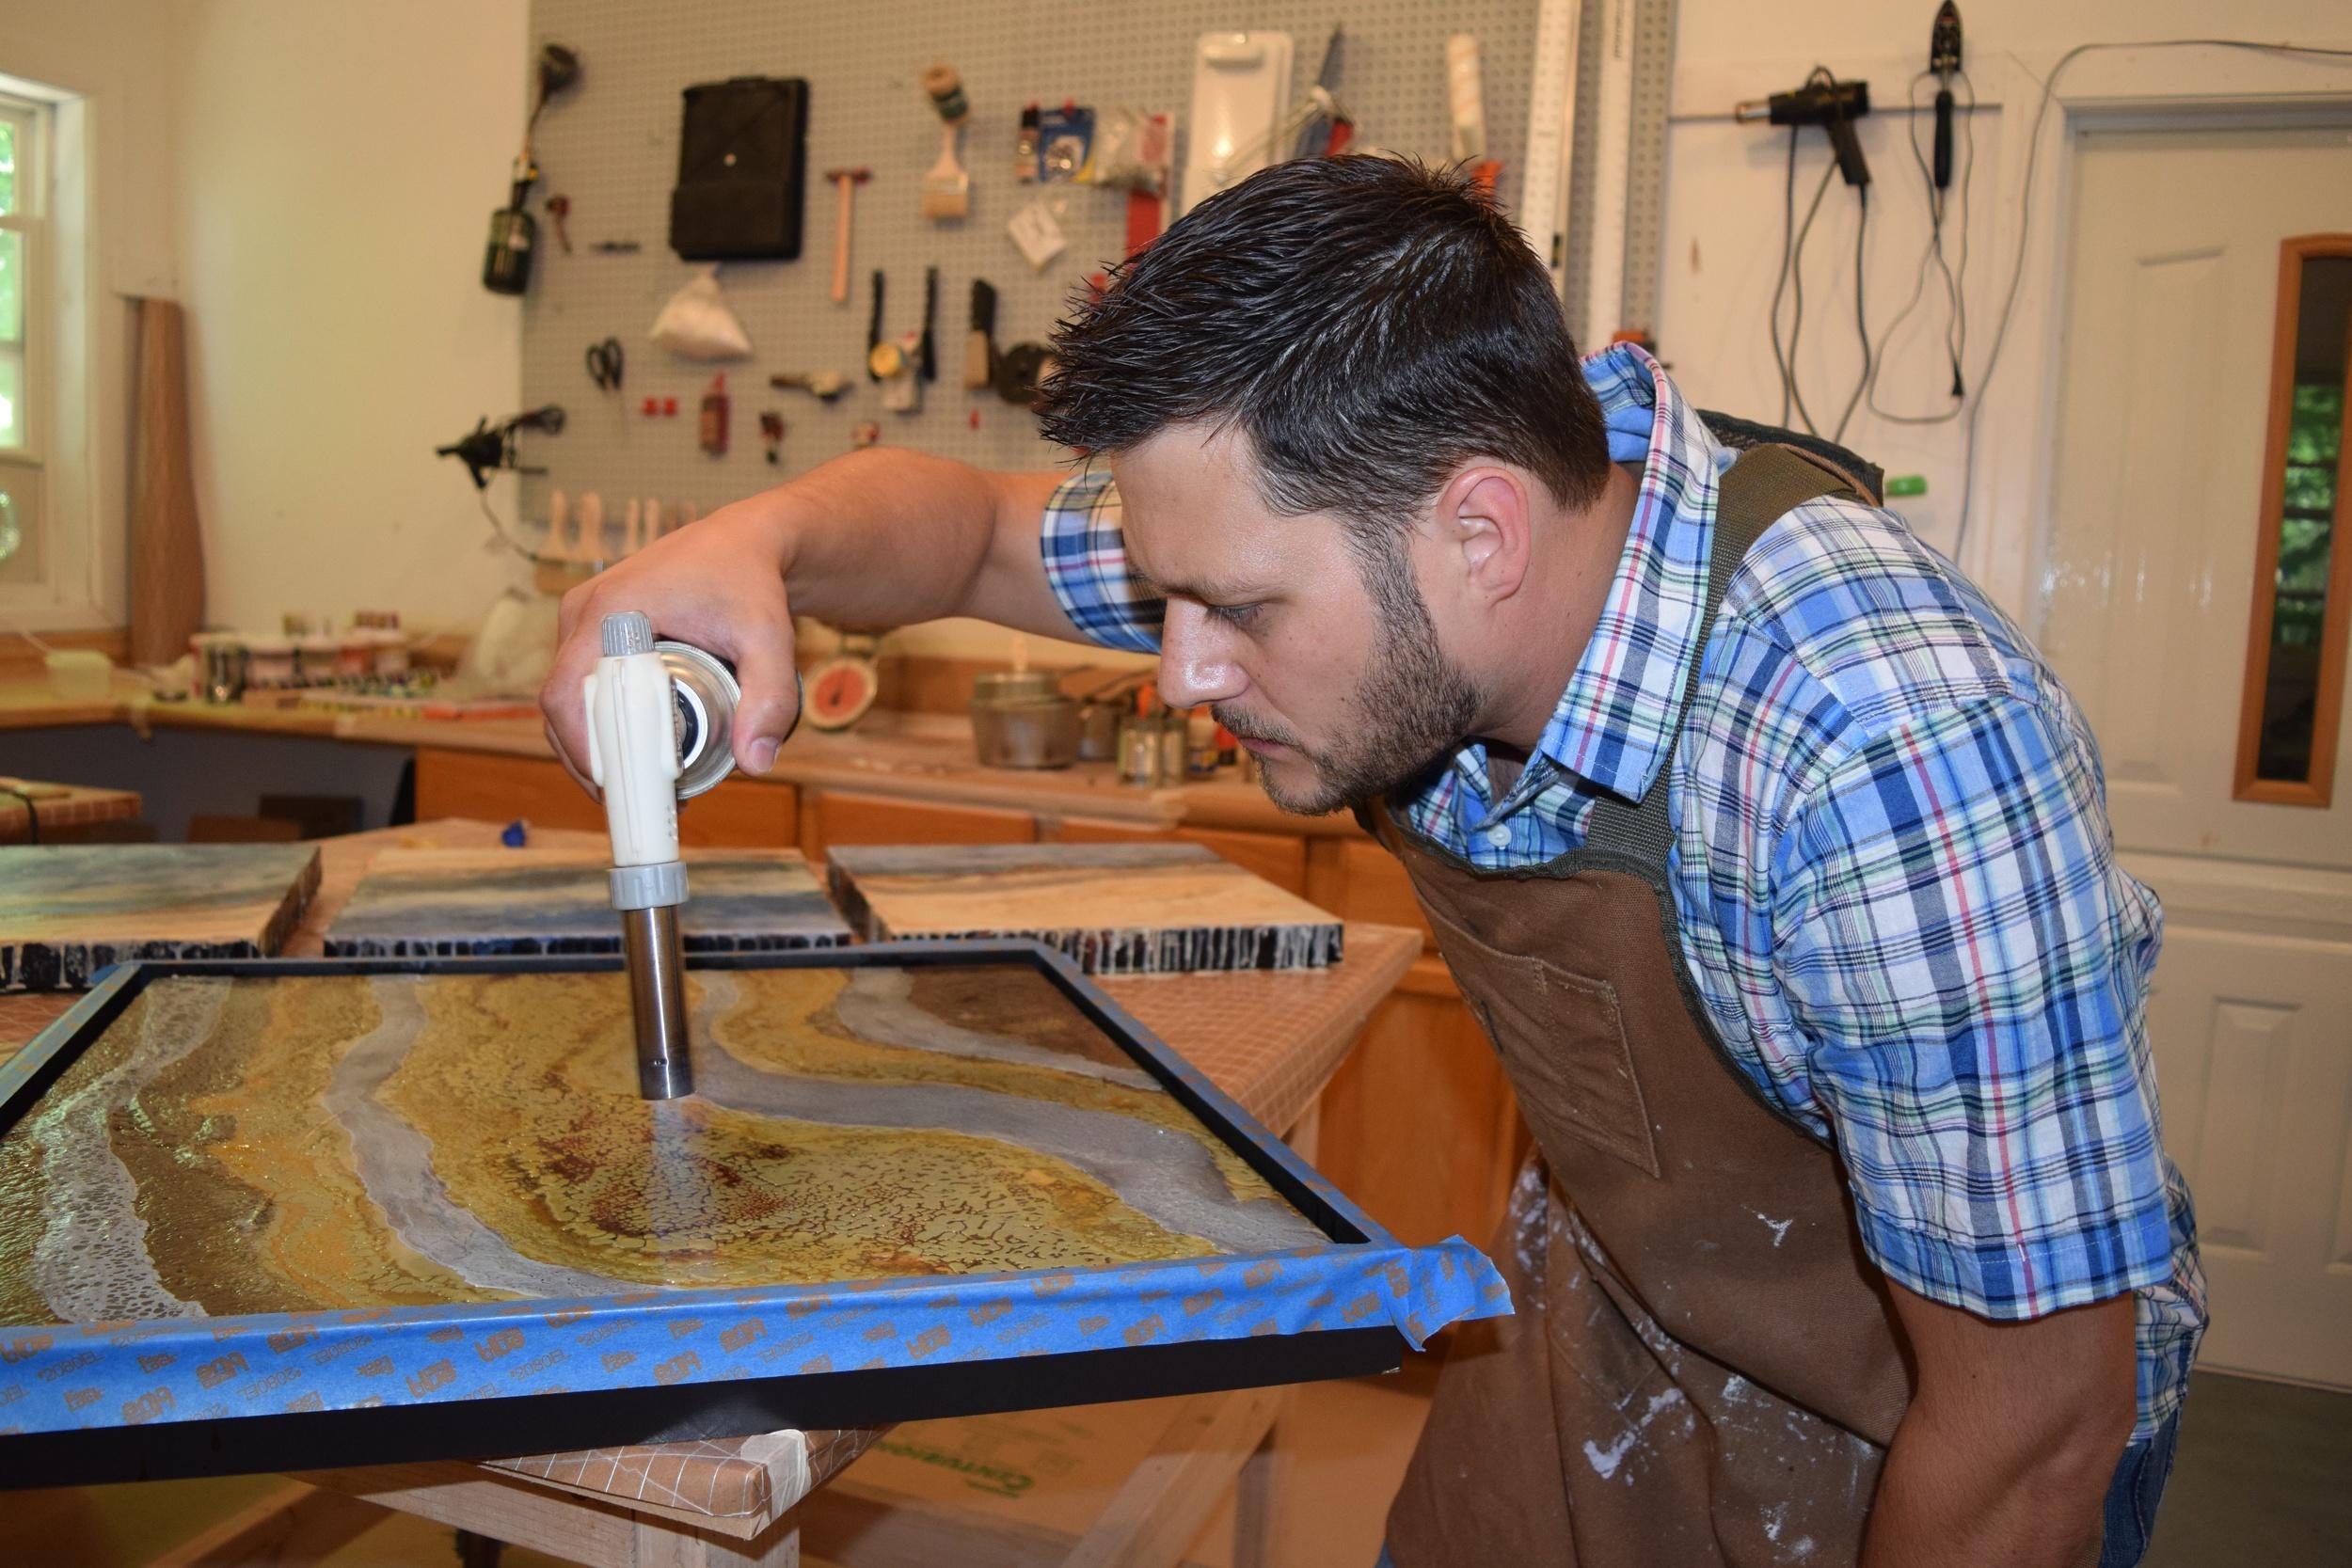 MacDougall Artist At Work 3 of 4.JPG